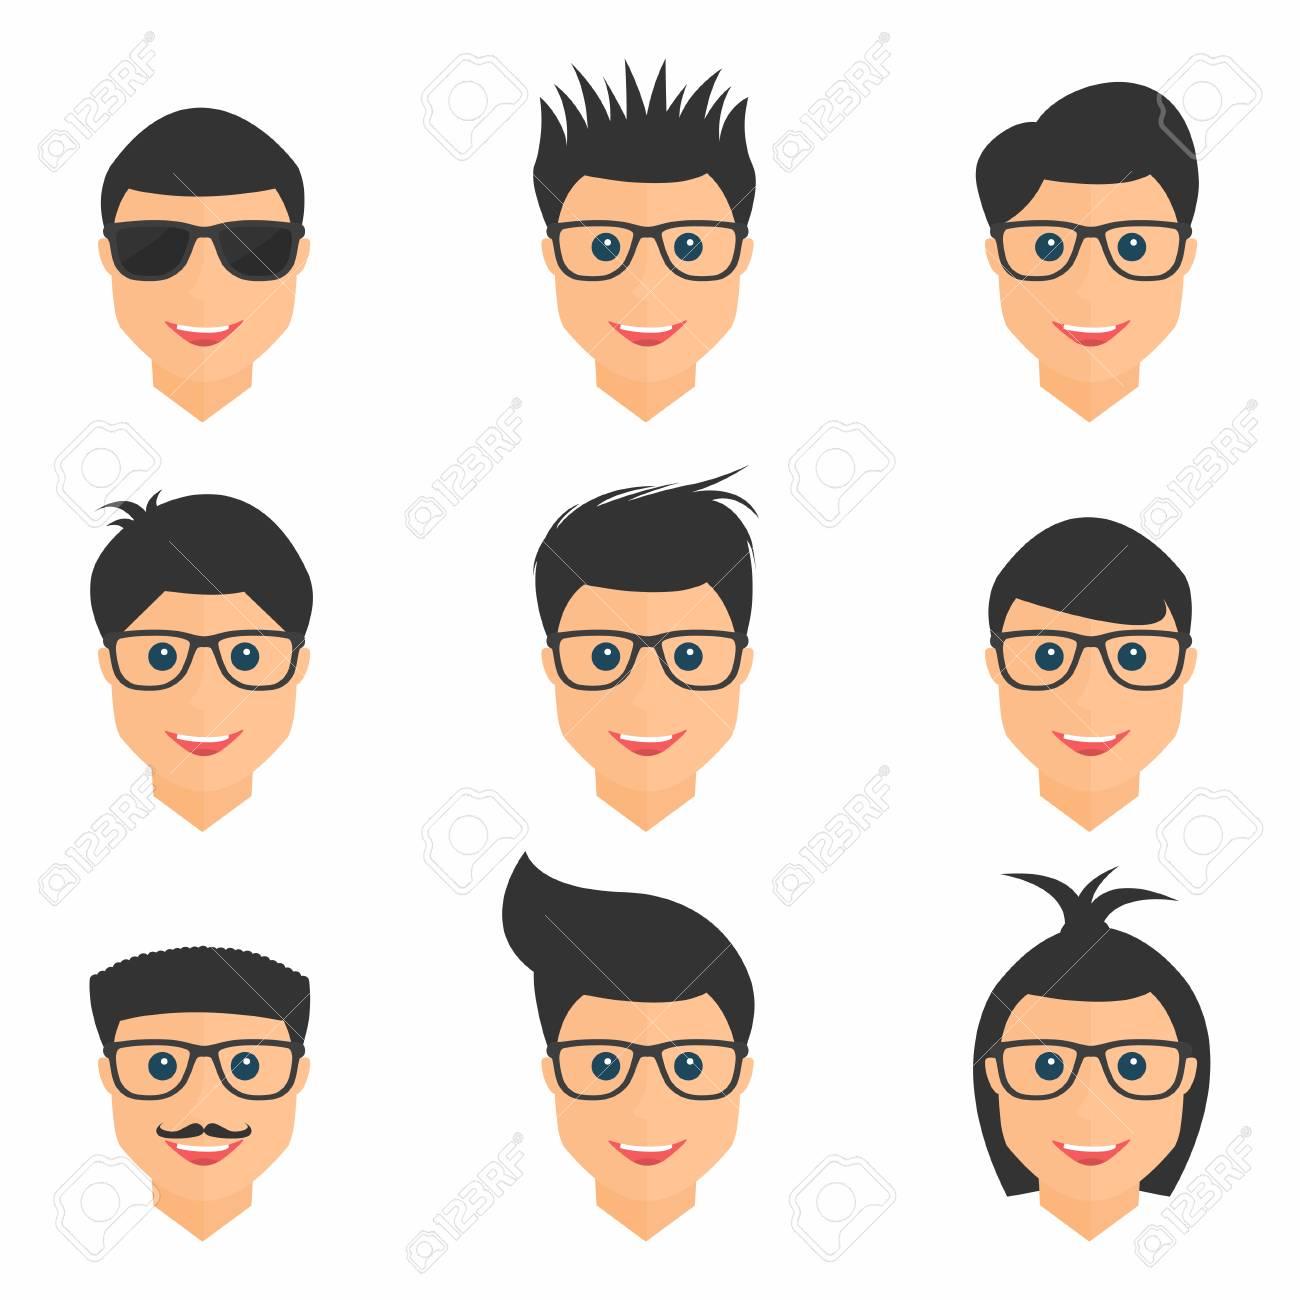 Peinados Establecidos Peinados Para Hombres En Forma Diferente